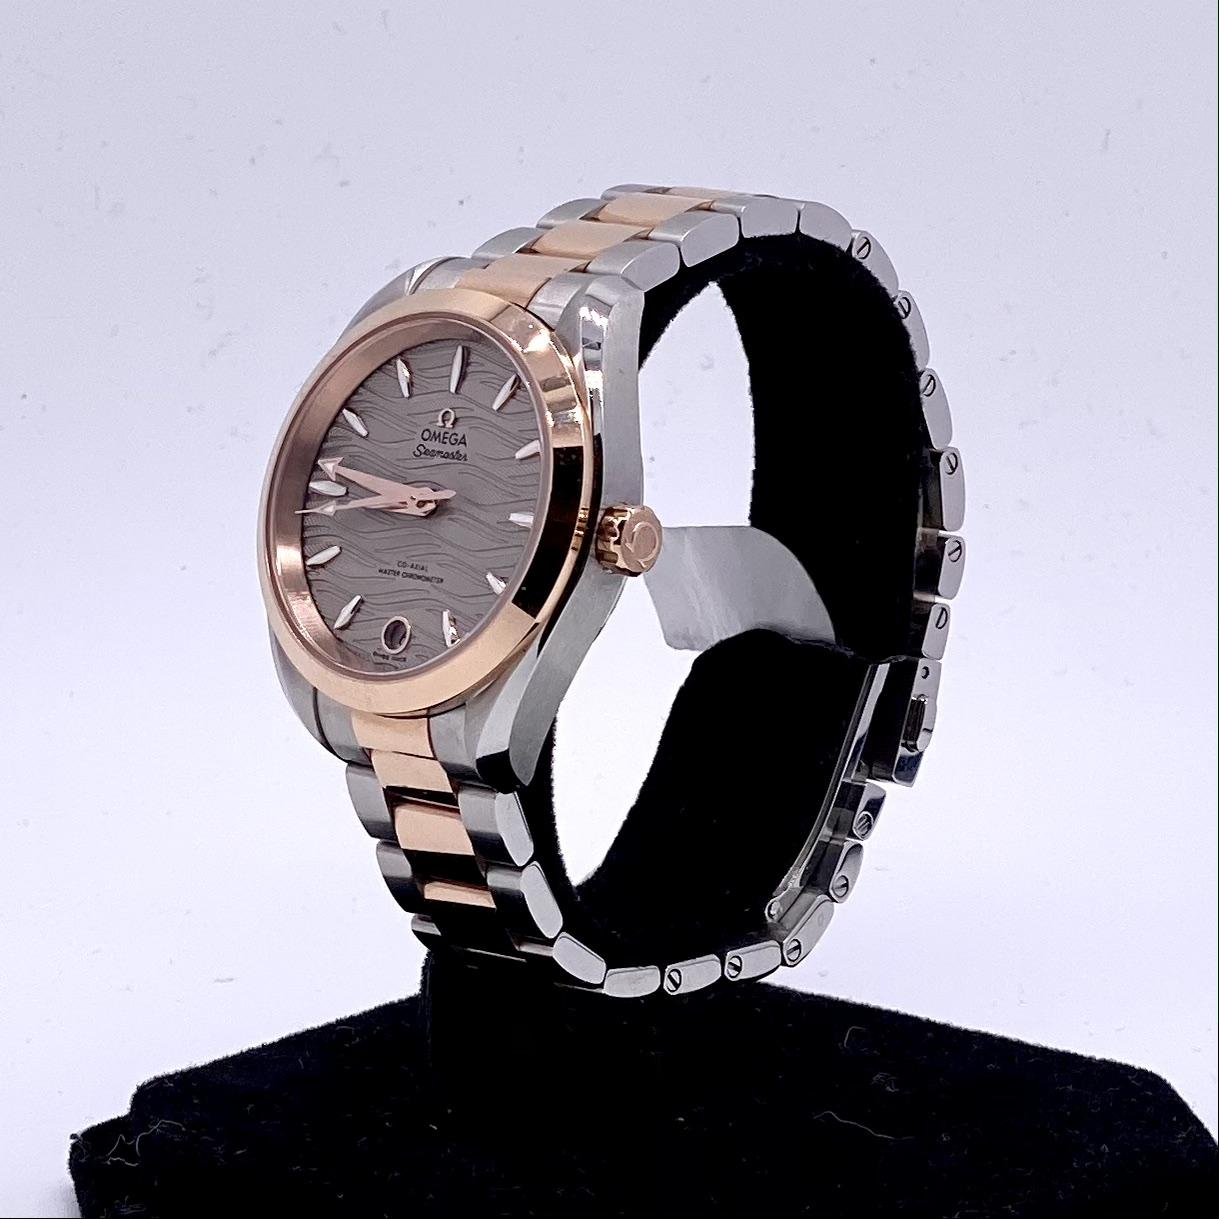 Omega Seamaster Aqua Terra Ladies Watch ref 22020342006001 - Image 2 of 3